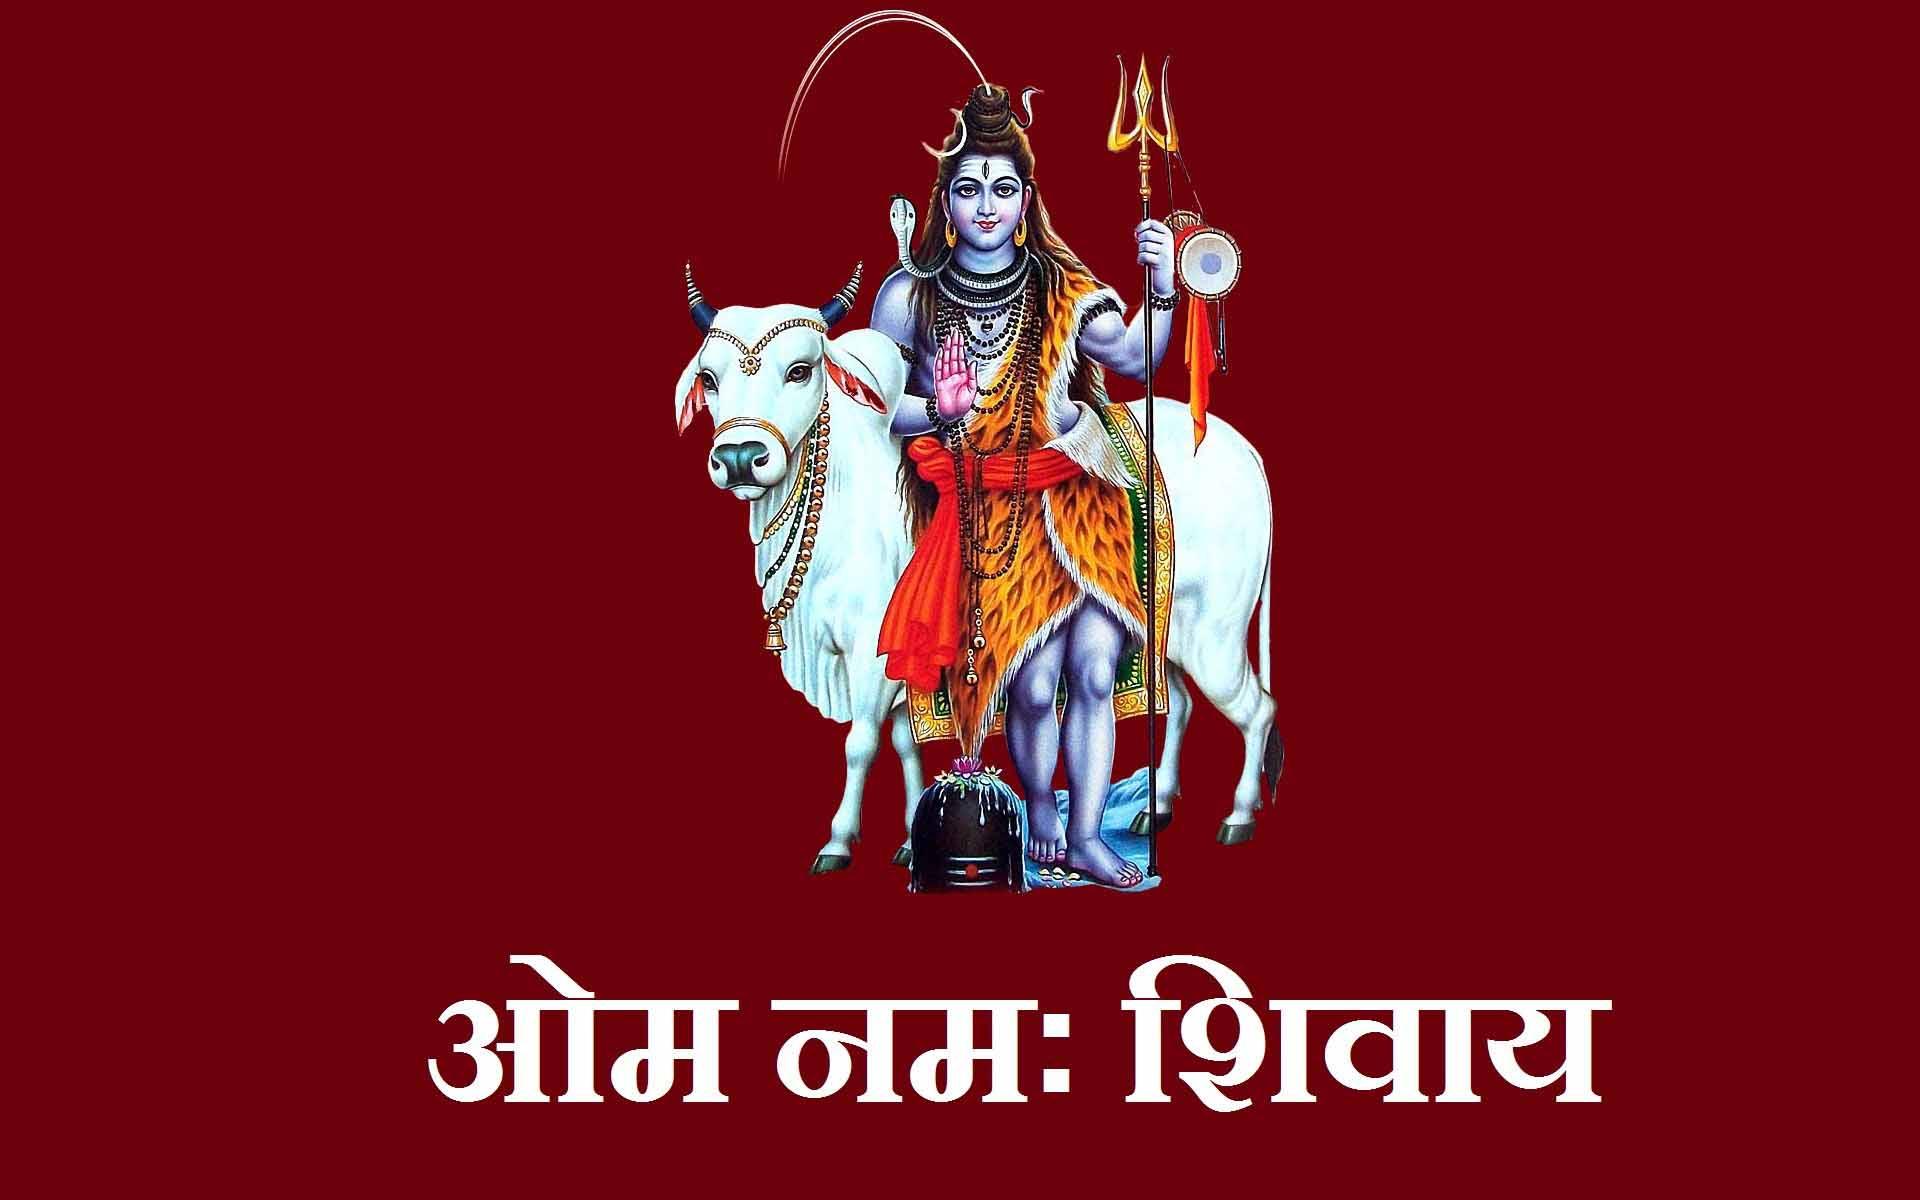 3d Images Of Bhagwan Shiv Ji - God New Year Gif , HD Wallpaper & Backgrounds